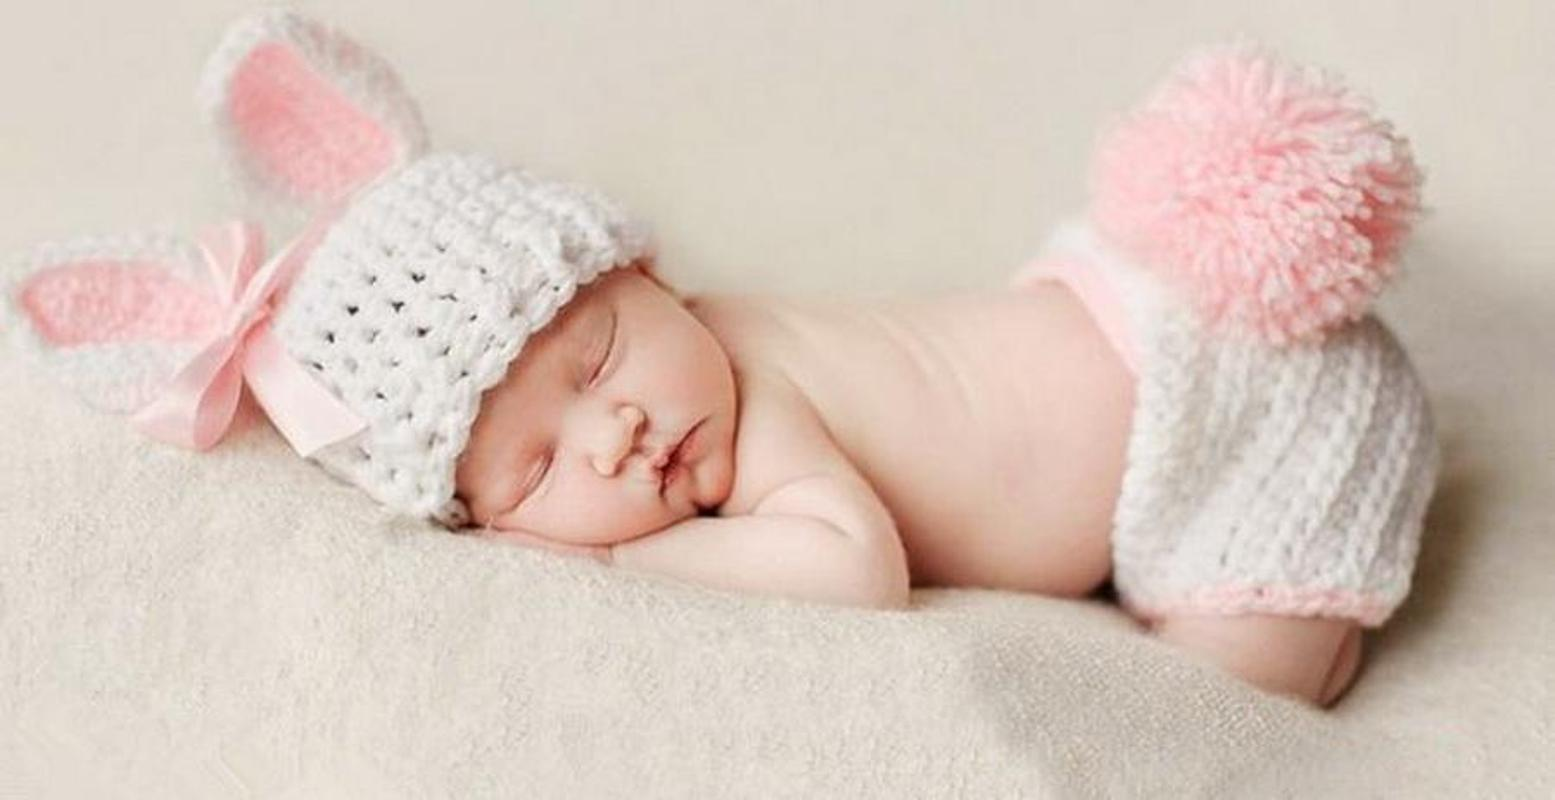 50set Hat Suspender Pants Set Handmade Infant Baby Photo Costume Crochet Newborn Baby Photo props accessories